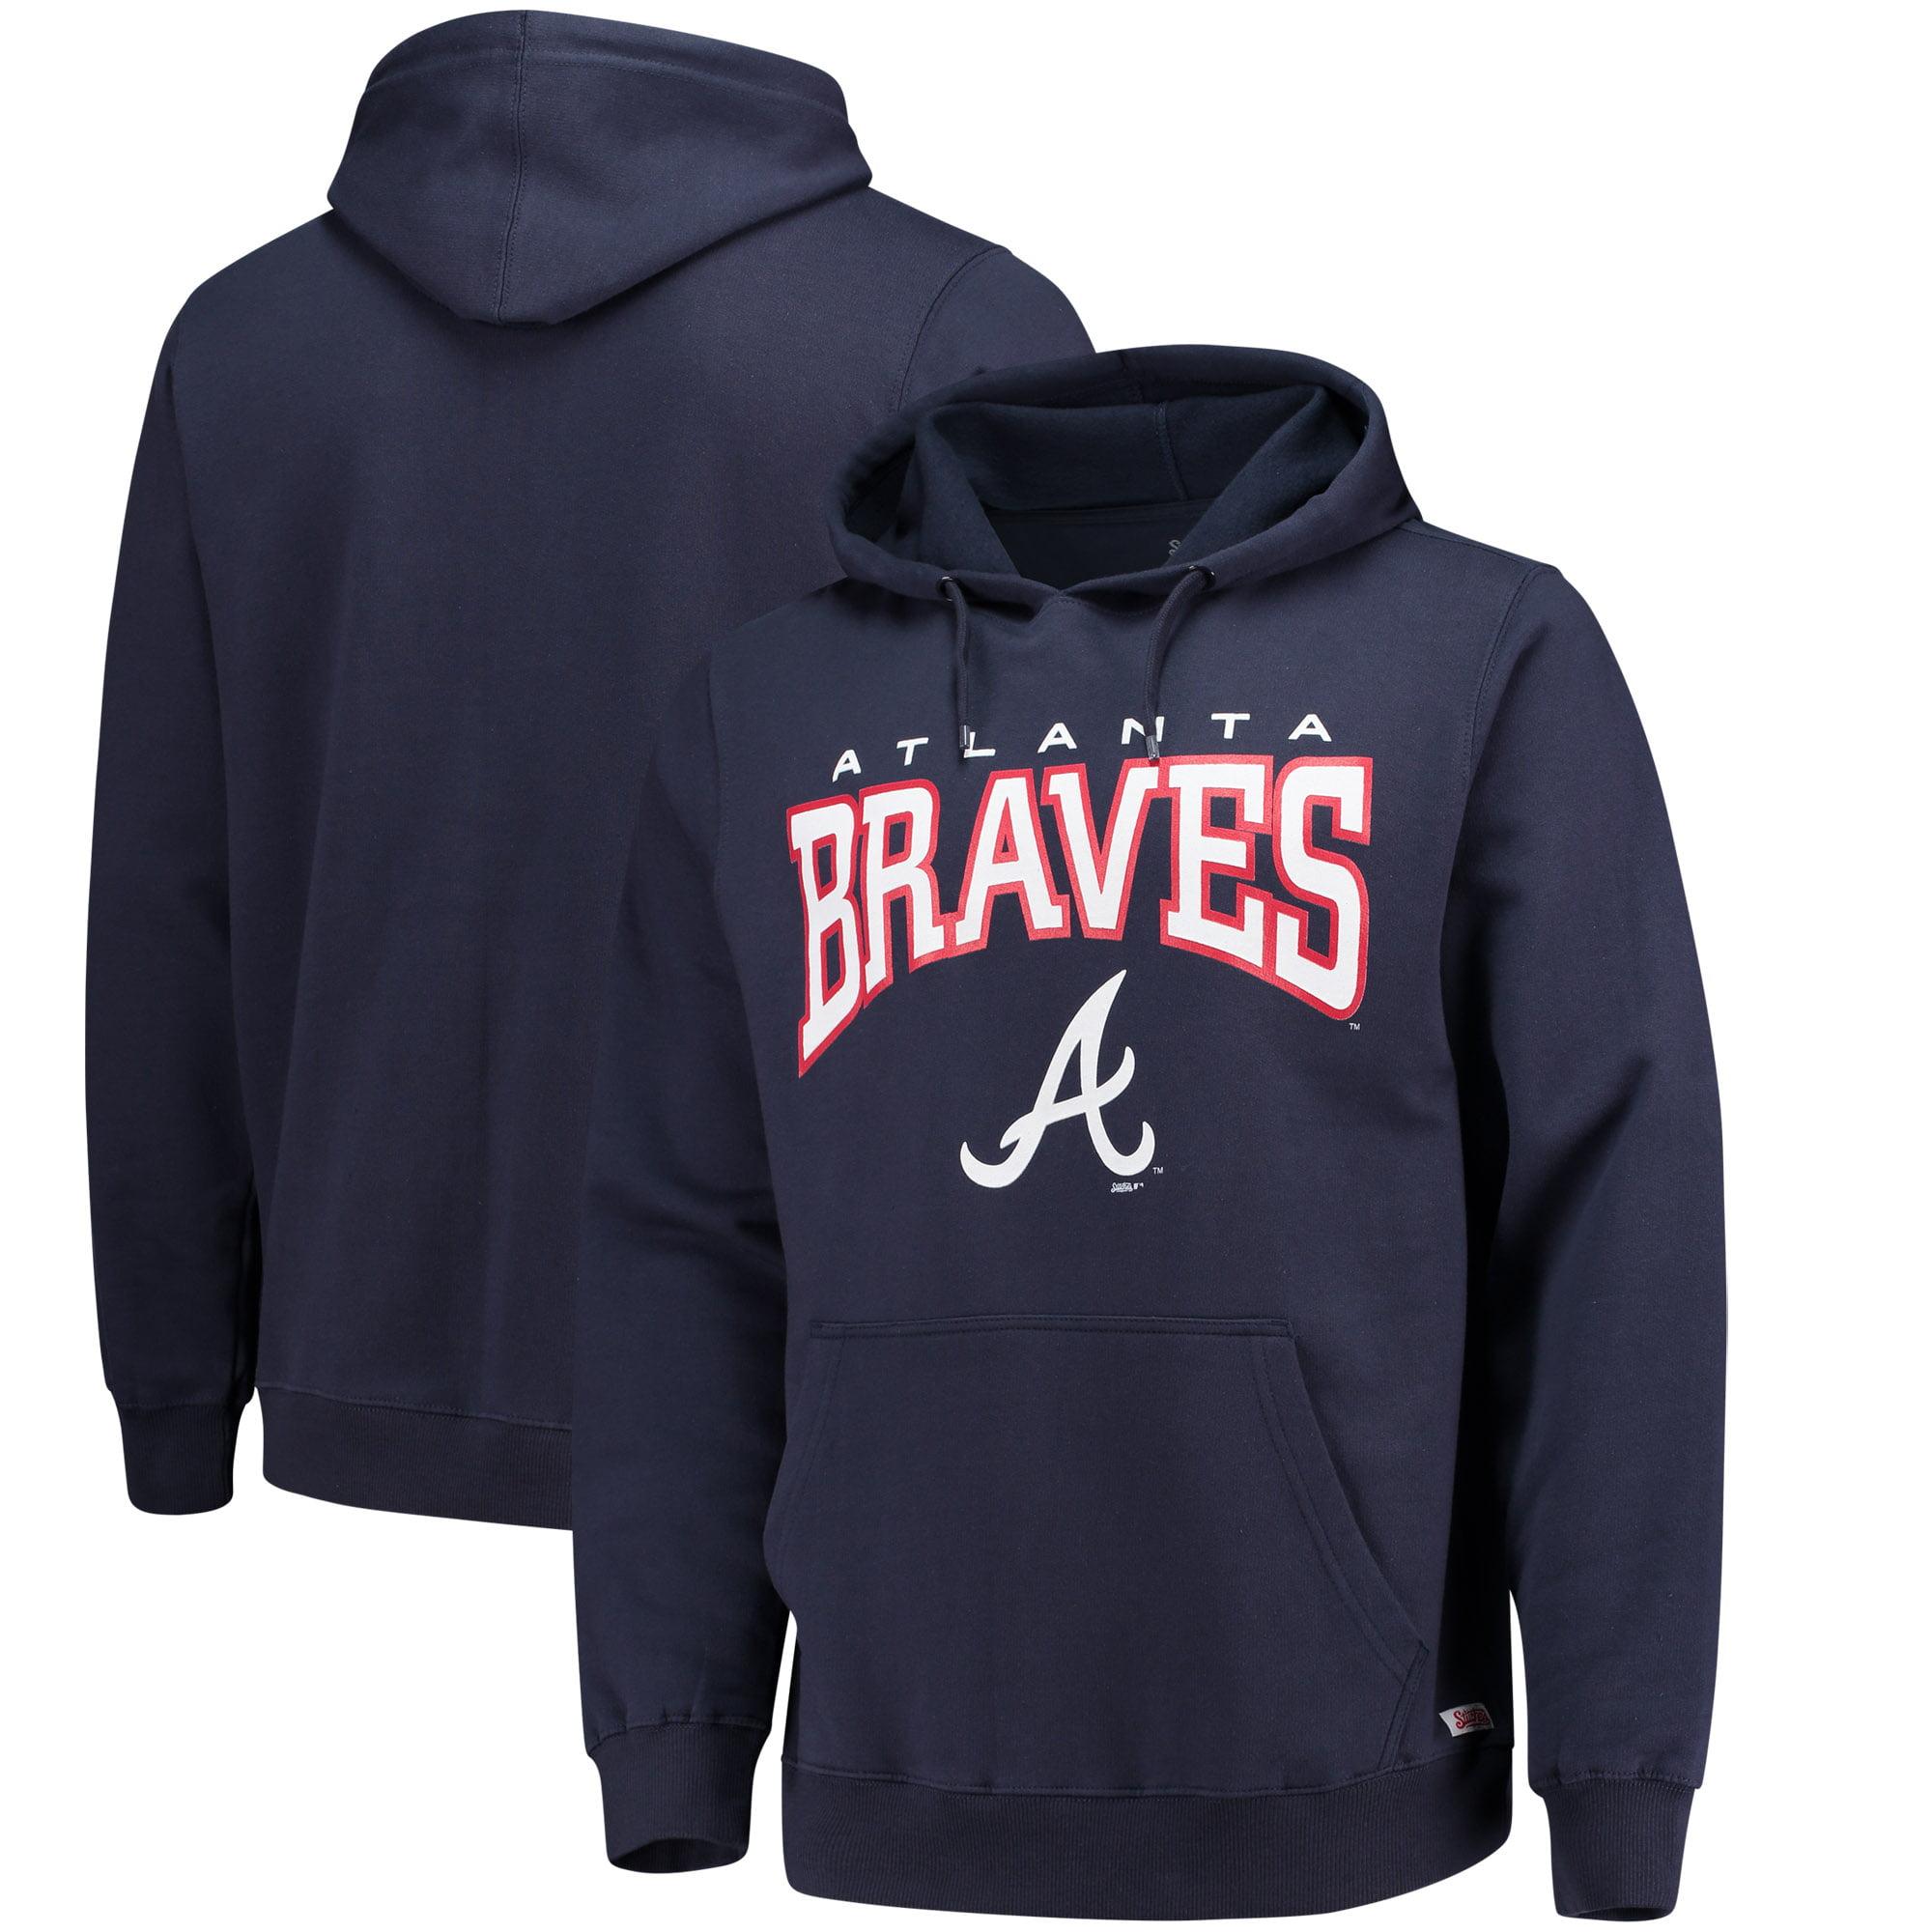 Atlanta Braves Stitches Team Pullover Hoodie - Navy